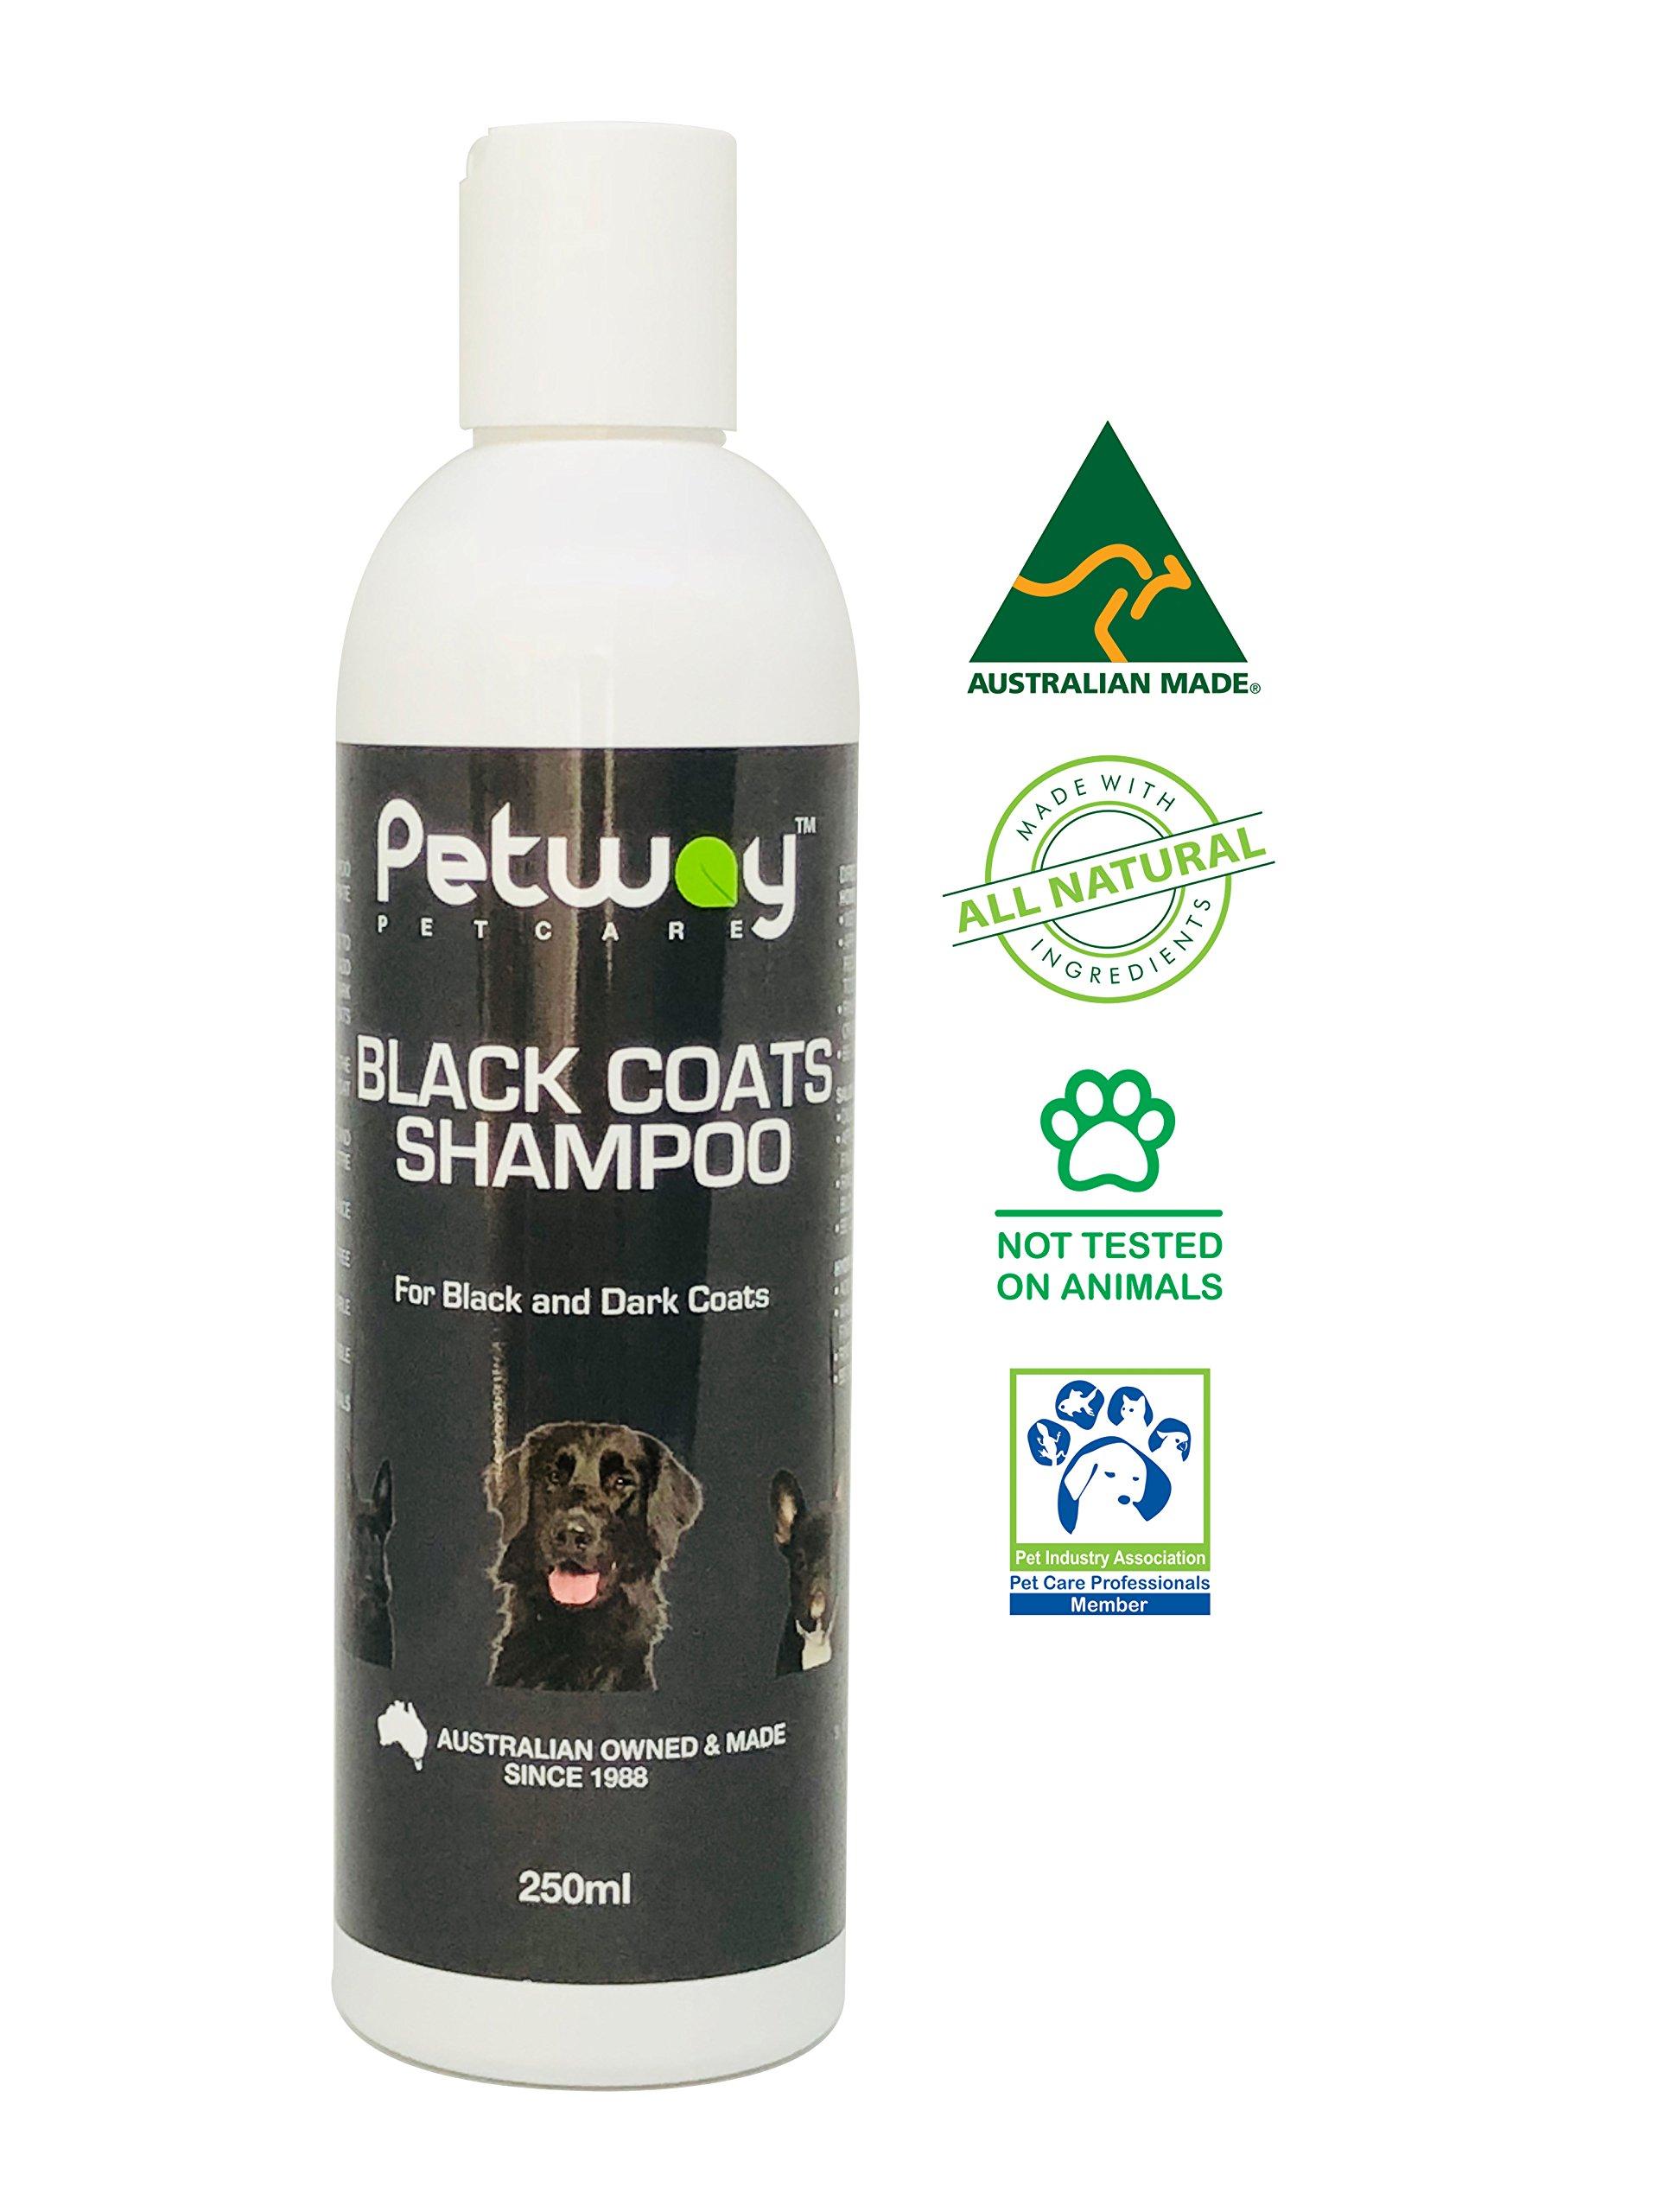 Petway Petcare Black Coat Shampoo – Natural Pet Shampoo for Animals with Black or Dark Coats, pH Balanced Biodegradable Dog Shampoo, Free of Phosphates, Parabens & Enzymes – 250ml